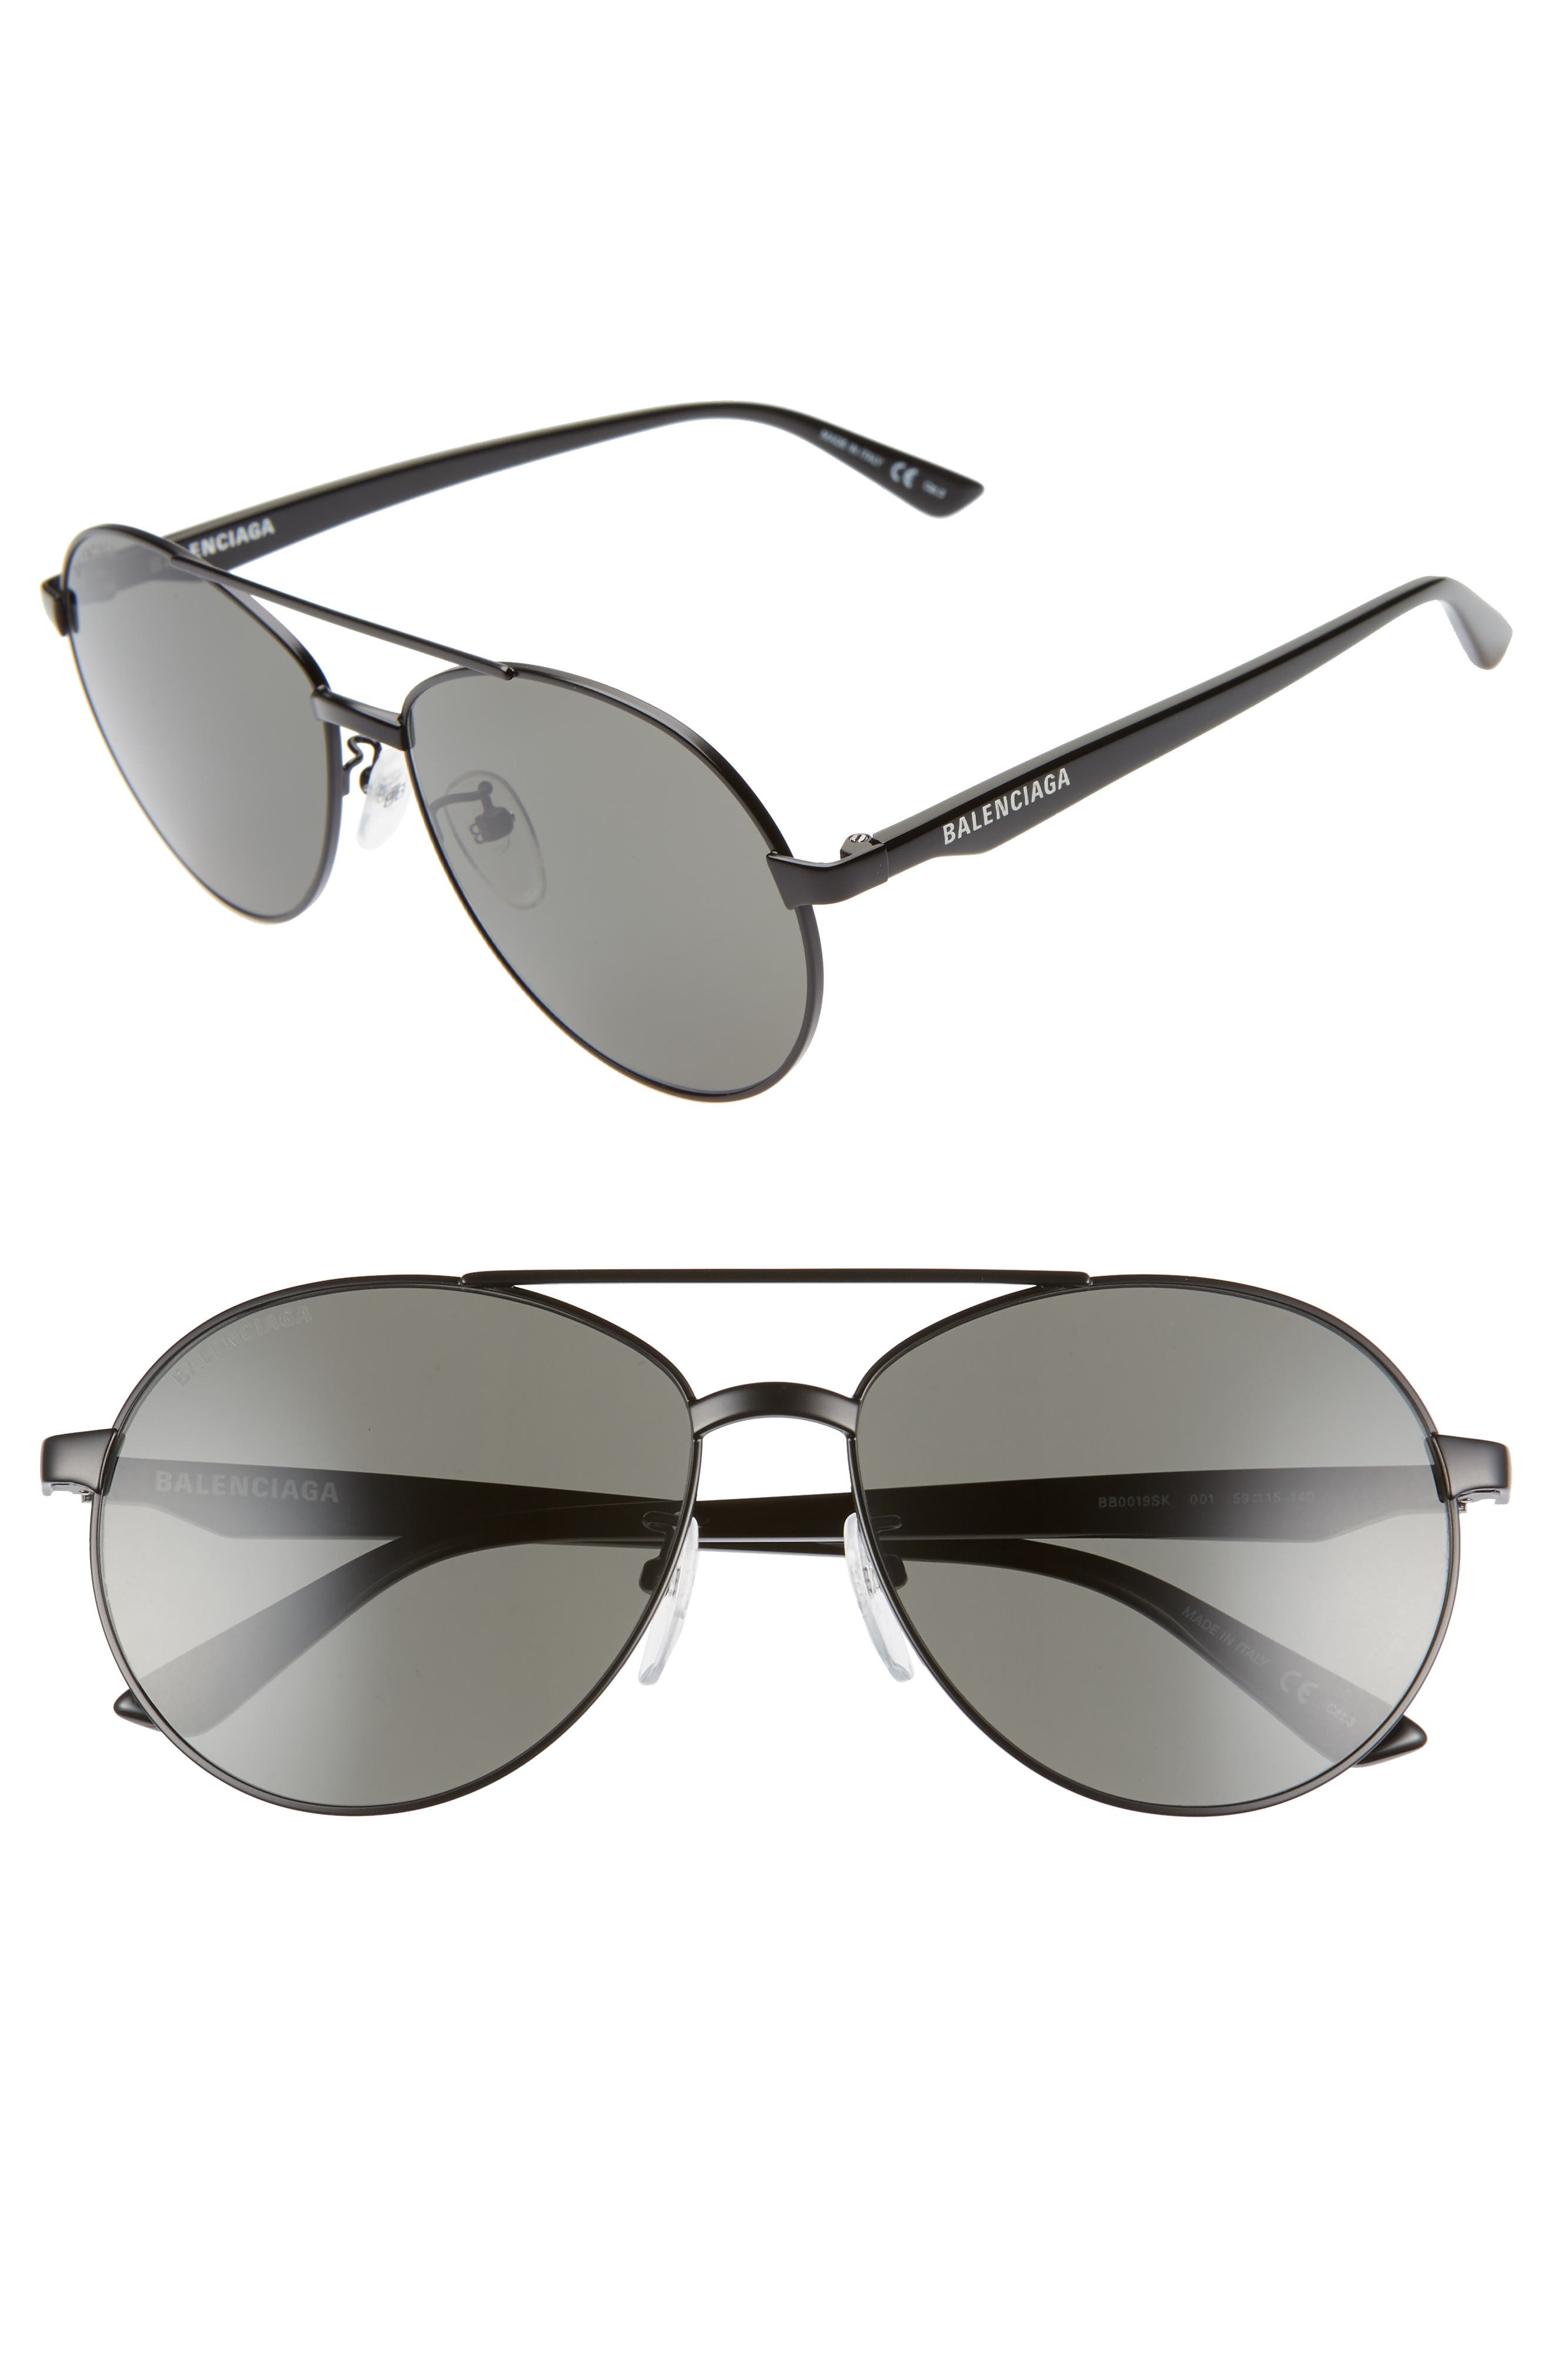 BALENCIAGA, 59mm Aviator Sunglasses, Main thumbnail 1, color, SEMI-MATTE BLACK/ GREY